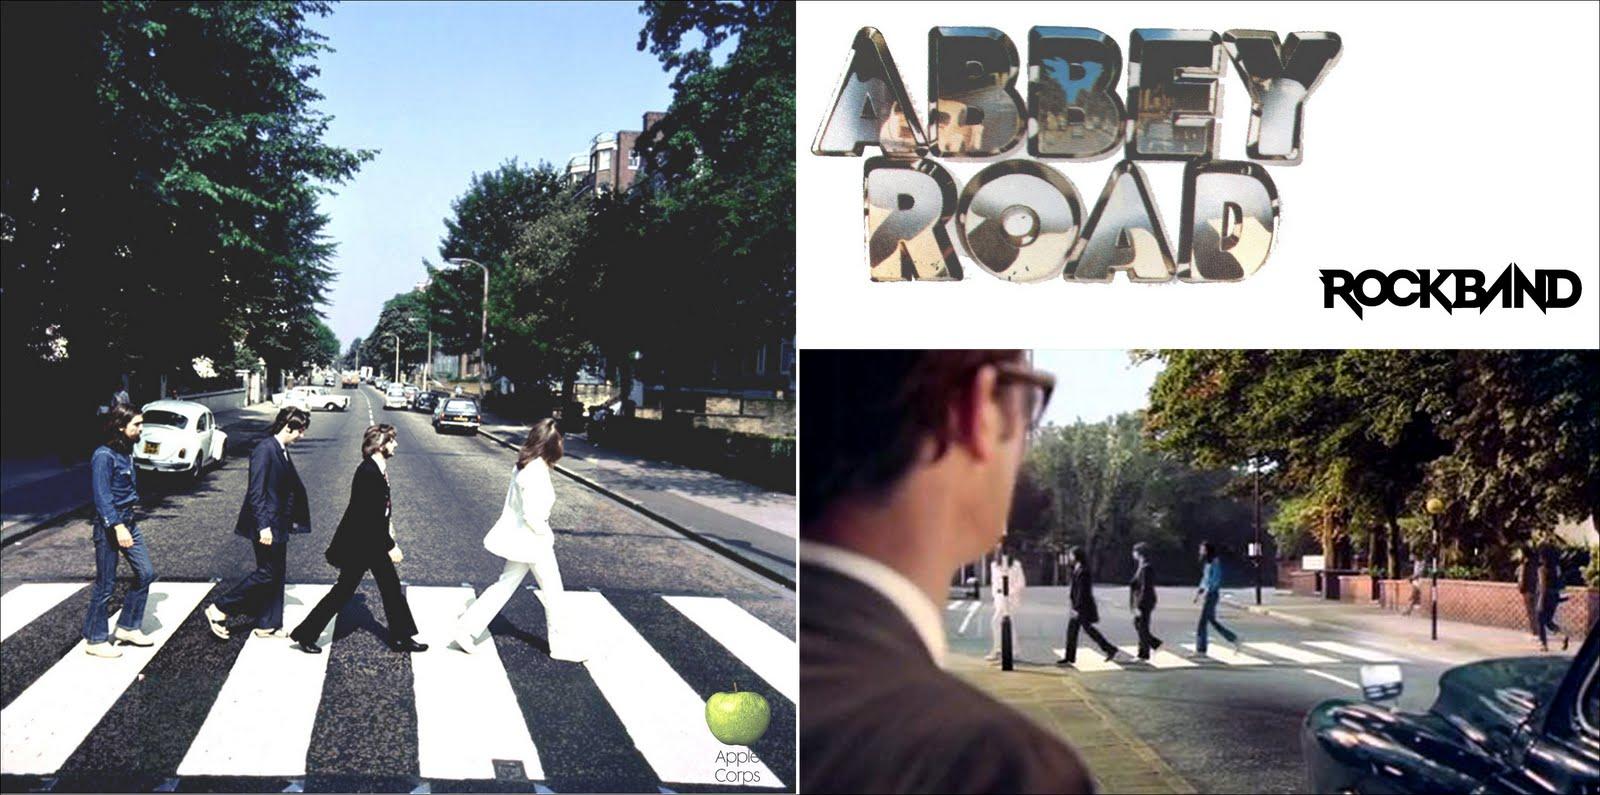 Beatles, Abbey Road (2009 Stereo Remaster) Full Album Zip